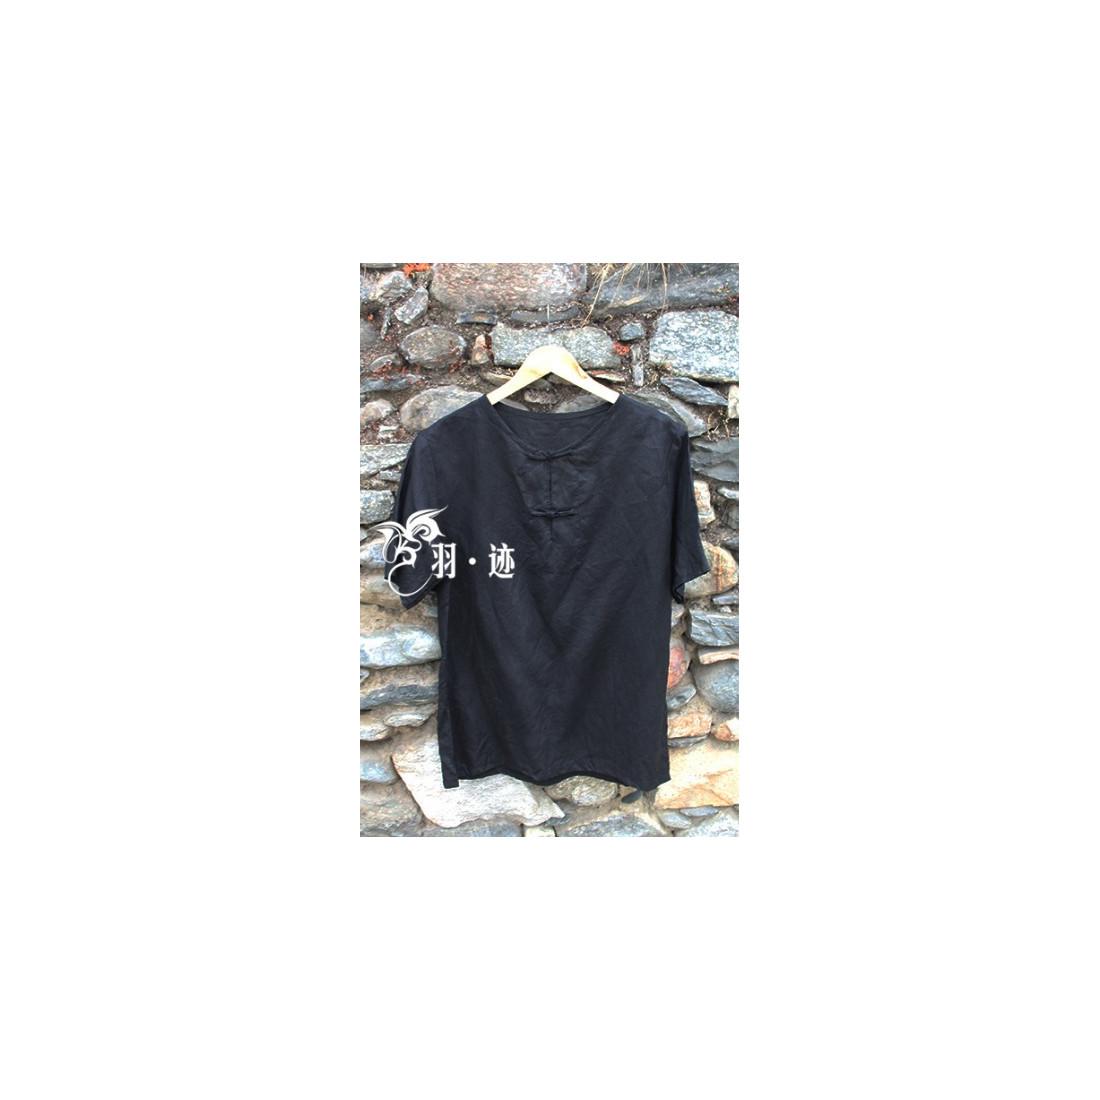 Черная рубашка (М103 Сяо Чжун)